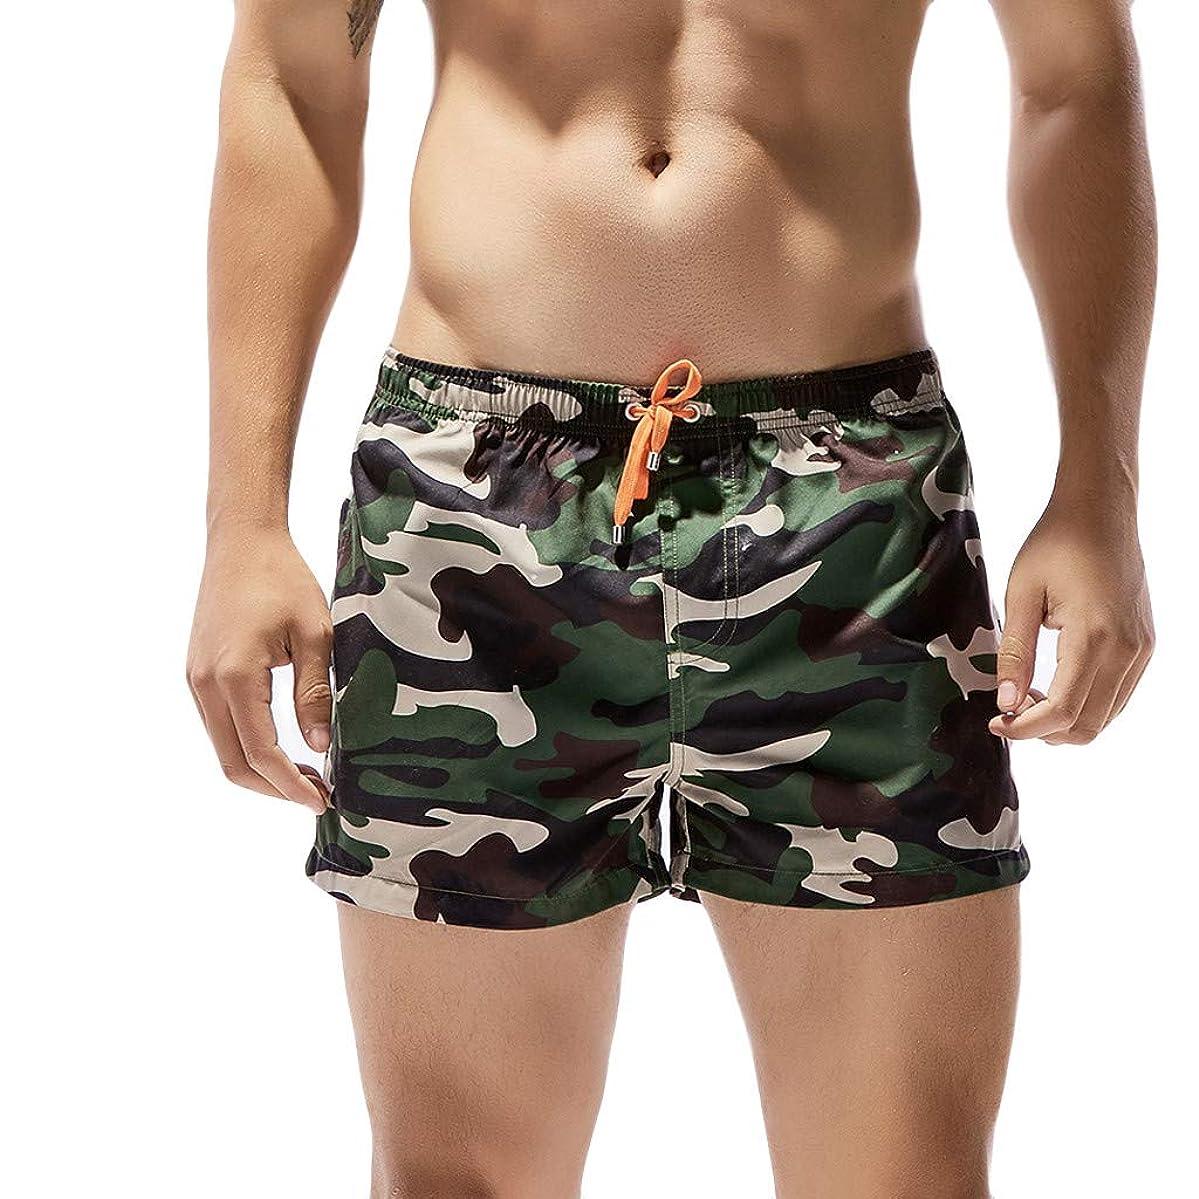 Men Swimwear Shorts,Jchen Mens Teen Boy Camouflage Swim Trunks Quick Dry Beach Surfing Running Swimming Shorts